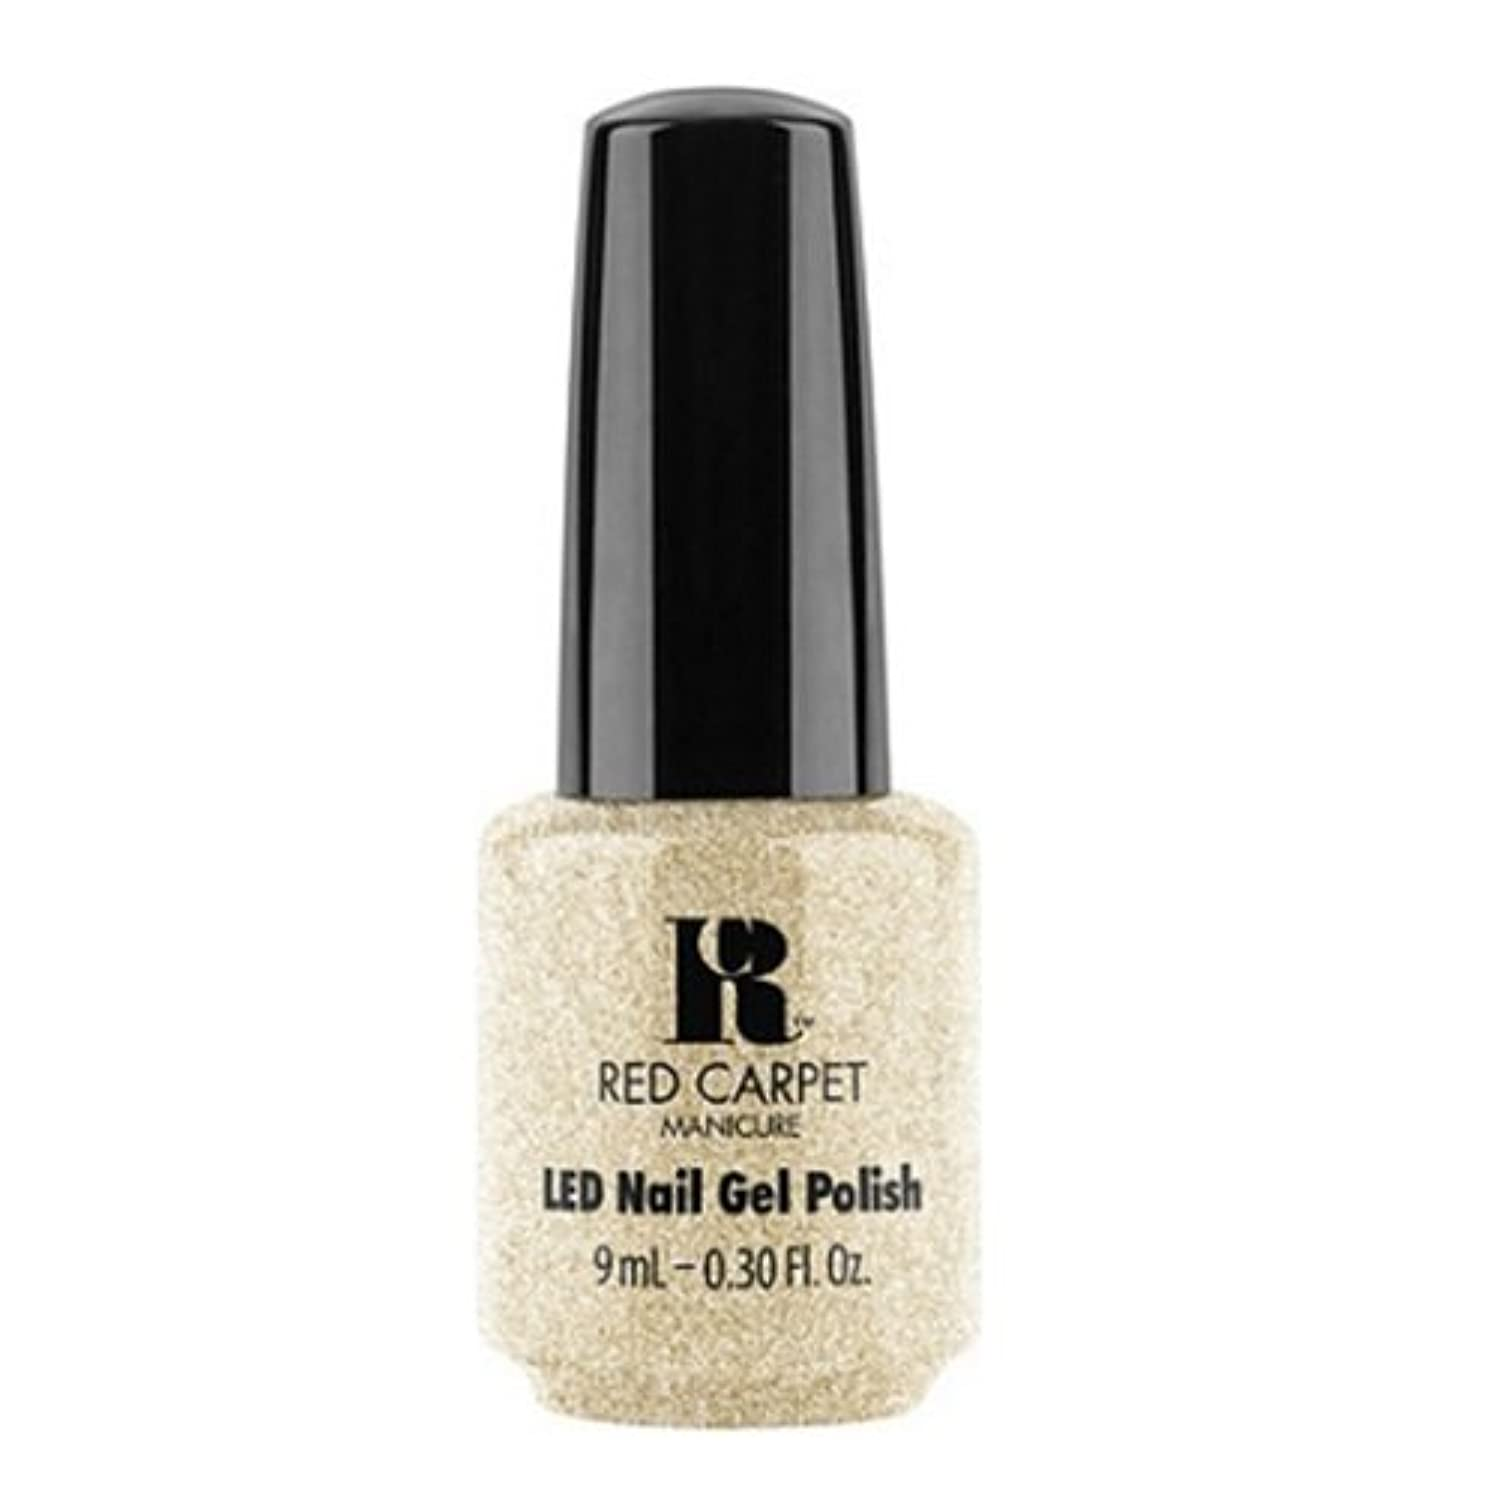 Red Carpet Manicure - LED Nail Gel Polish - All the Sparkles - 0.3oz / 9ml